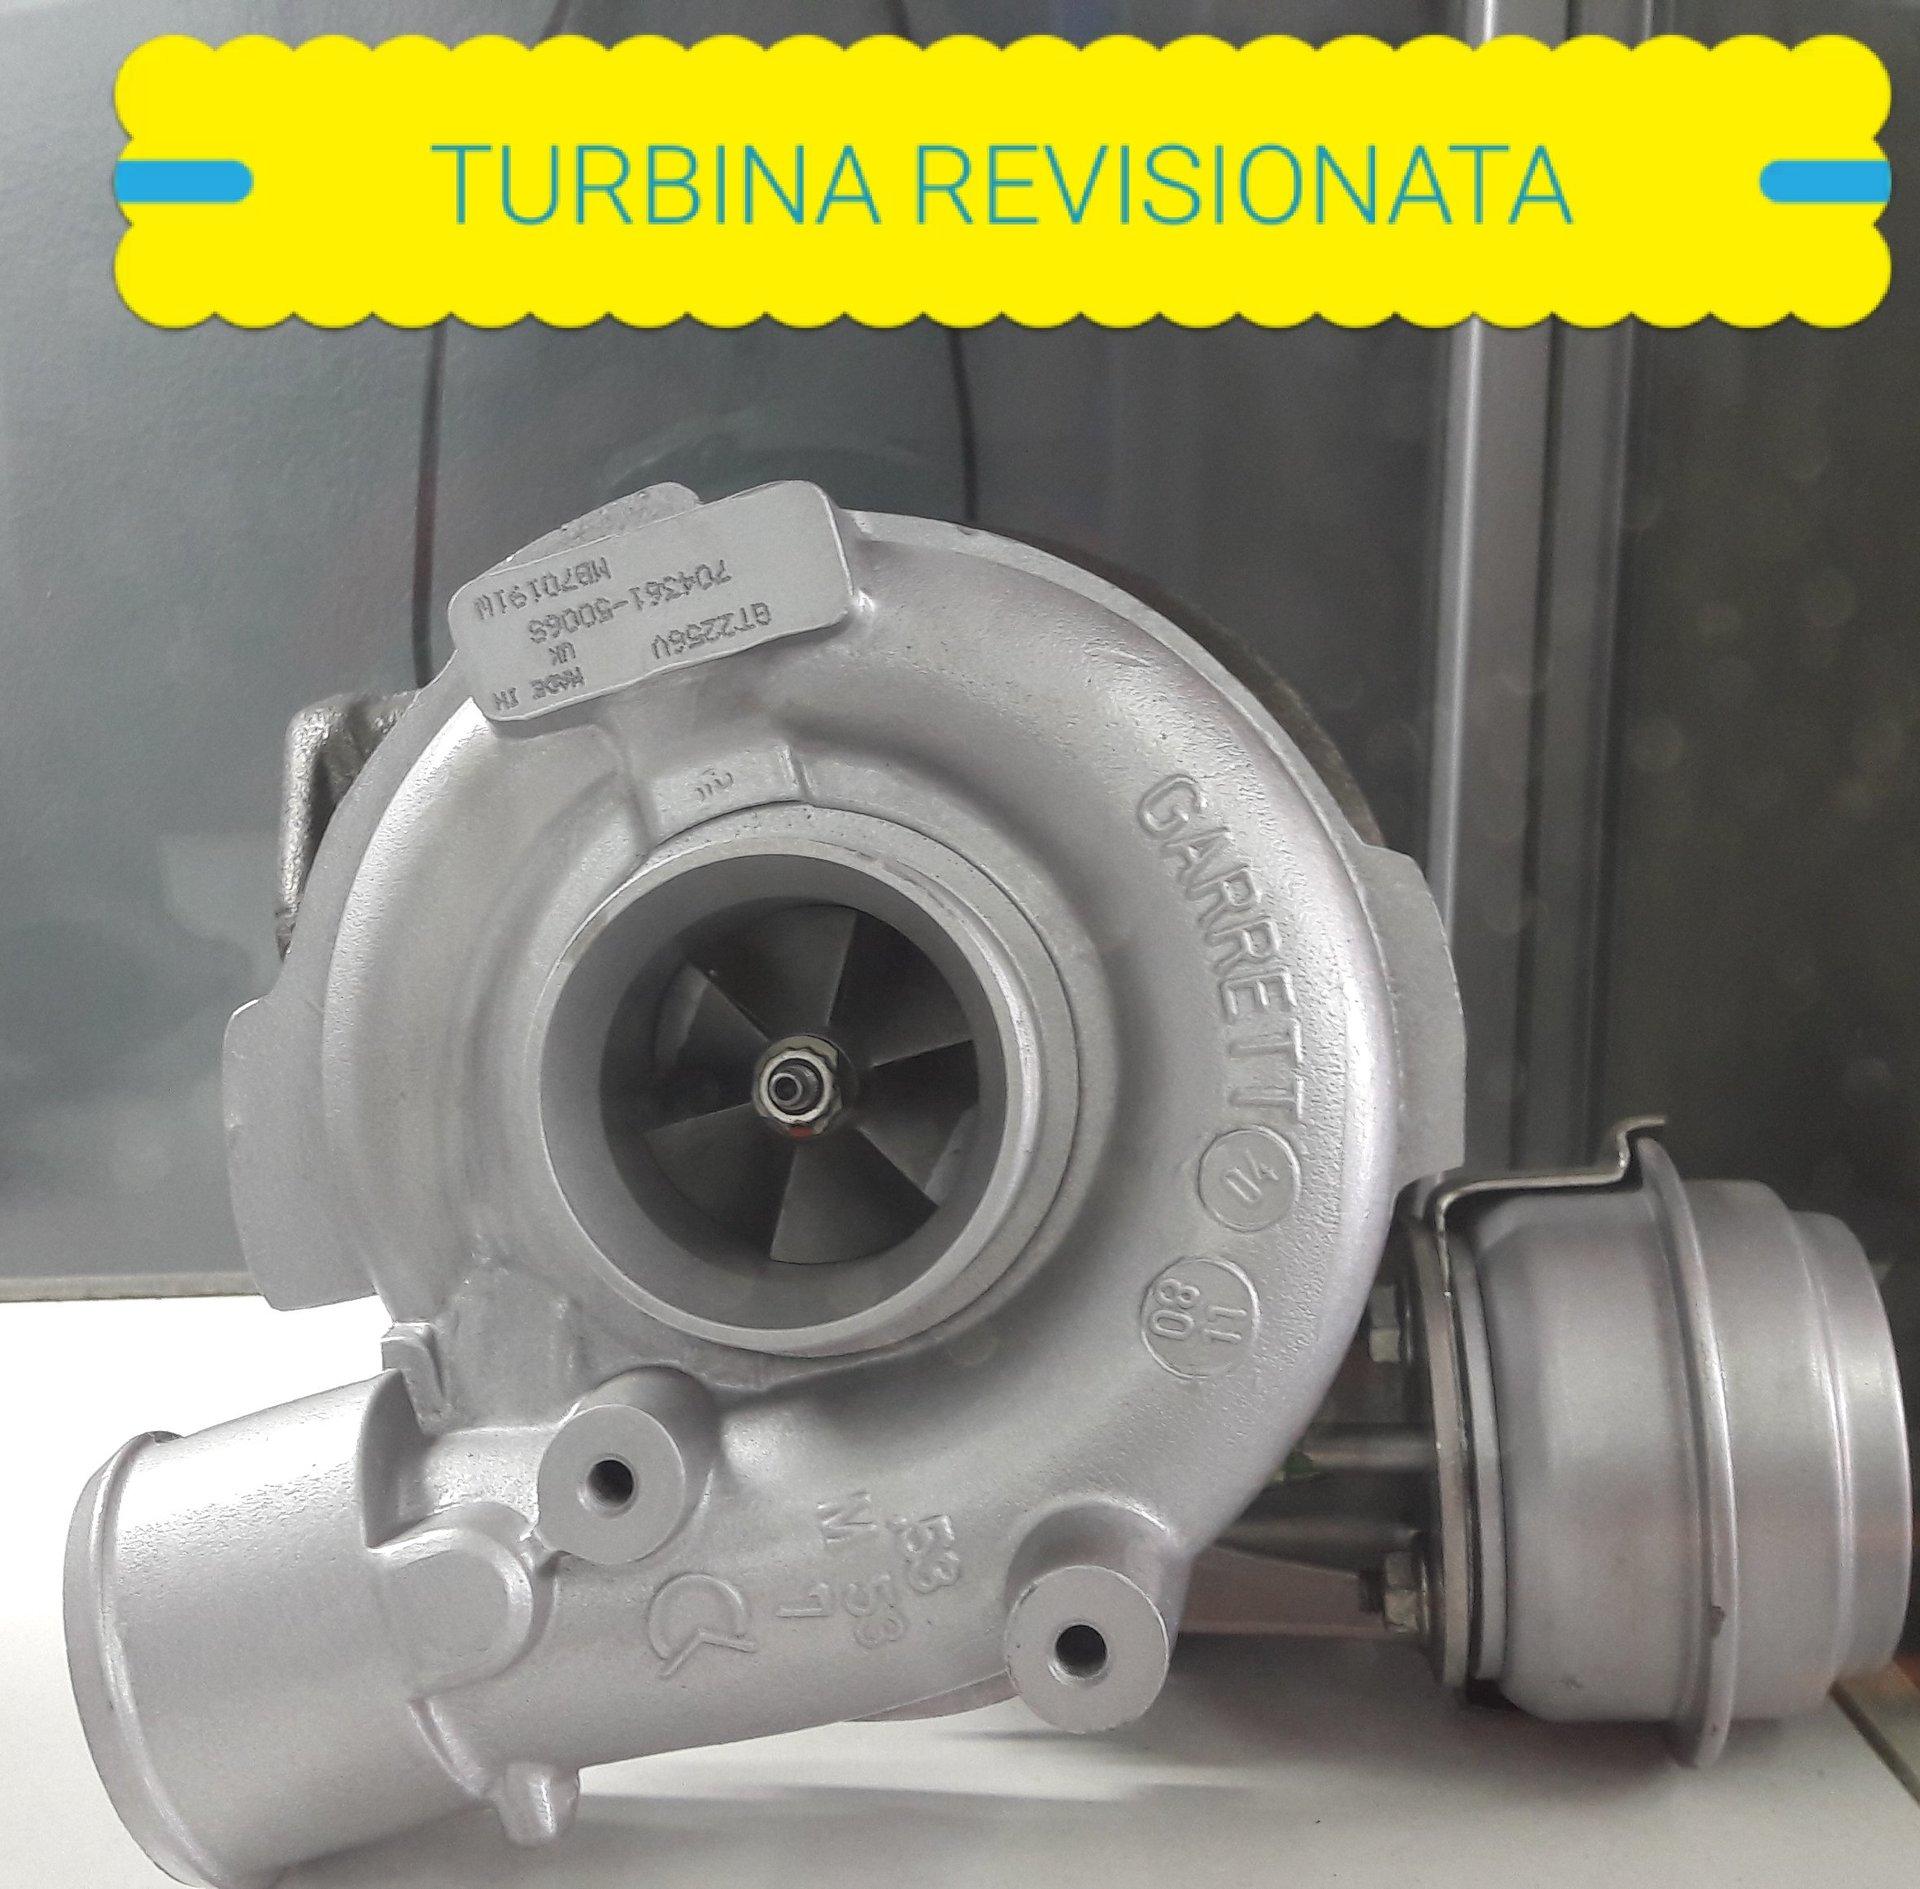 turbina revisionata